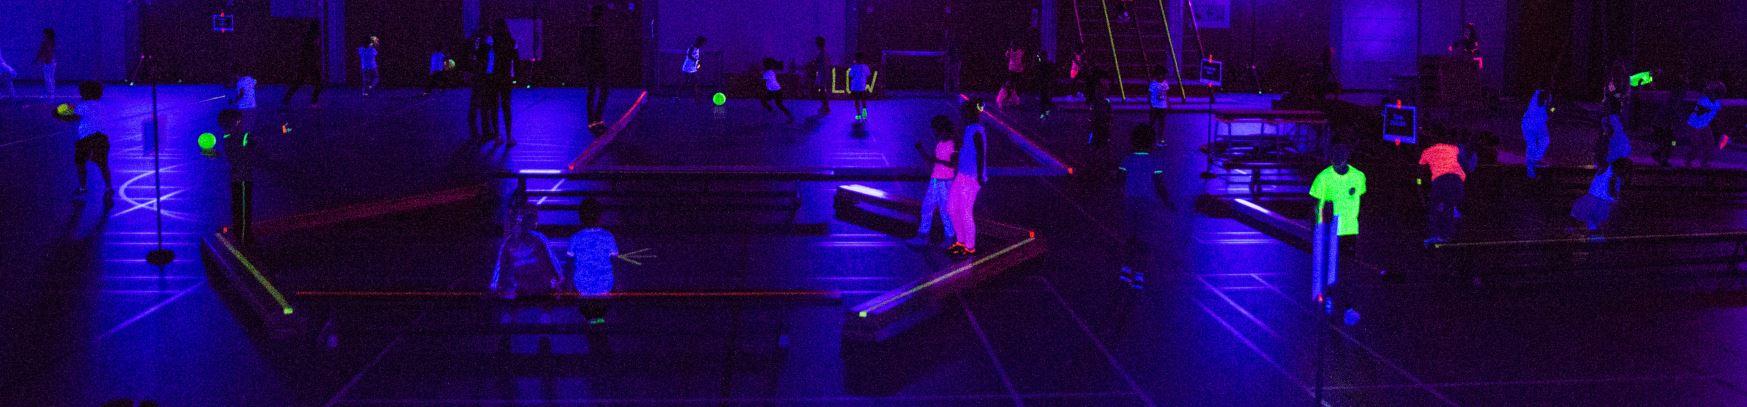 Sporten in het donker!